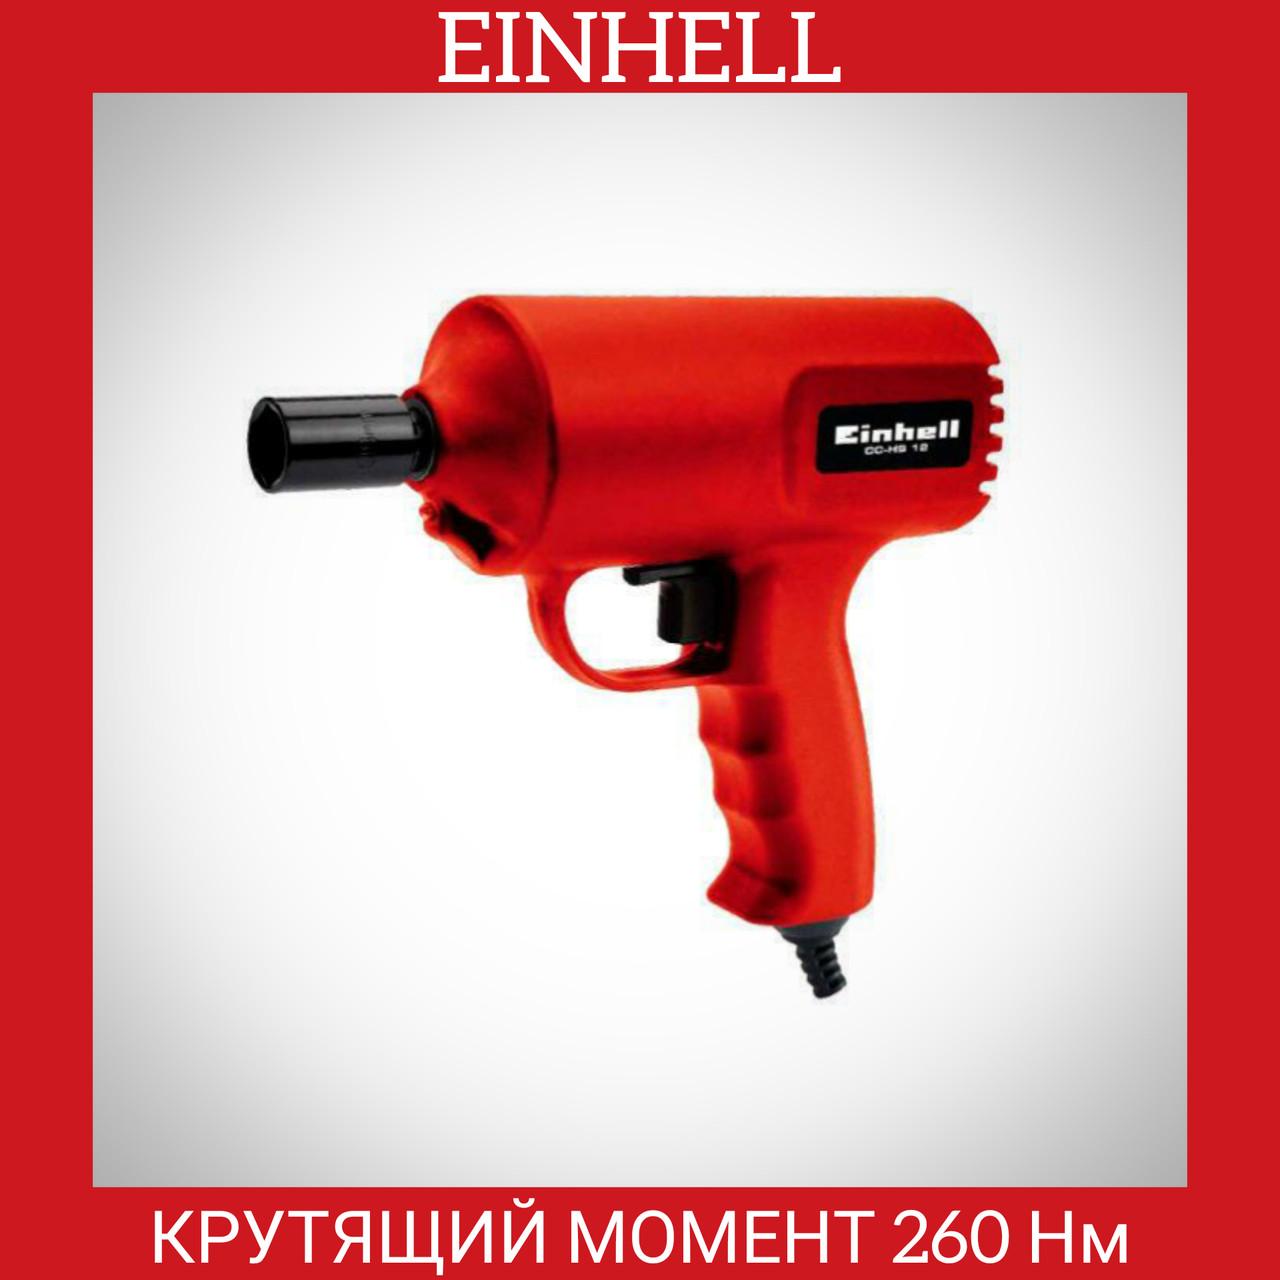 Гайковерт пневматический Einhell - CC-HS 12 Grey